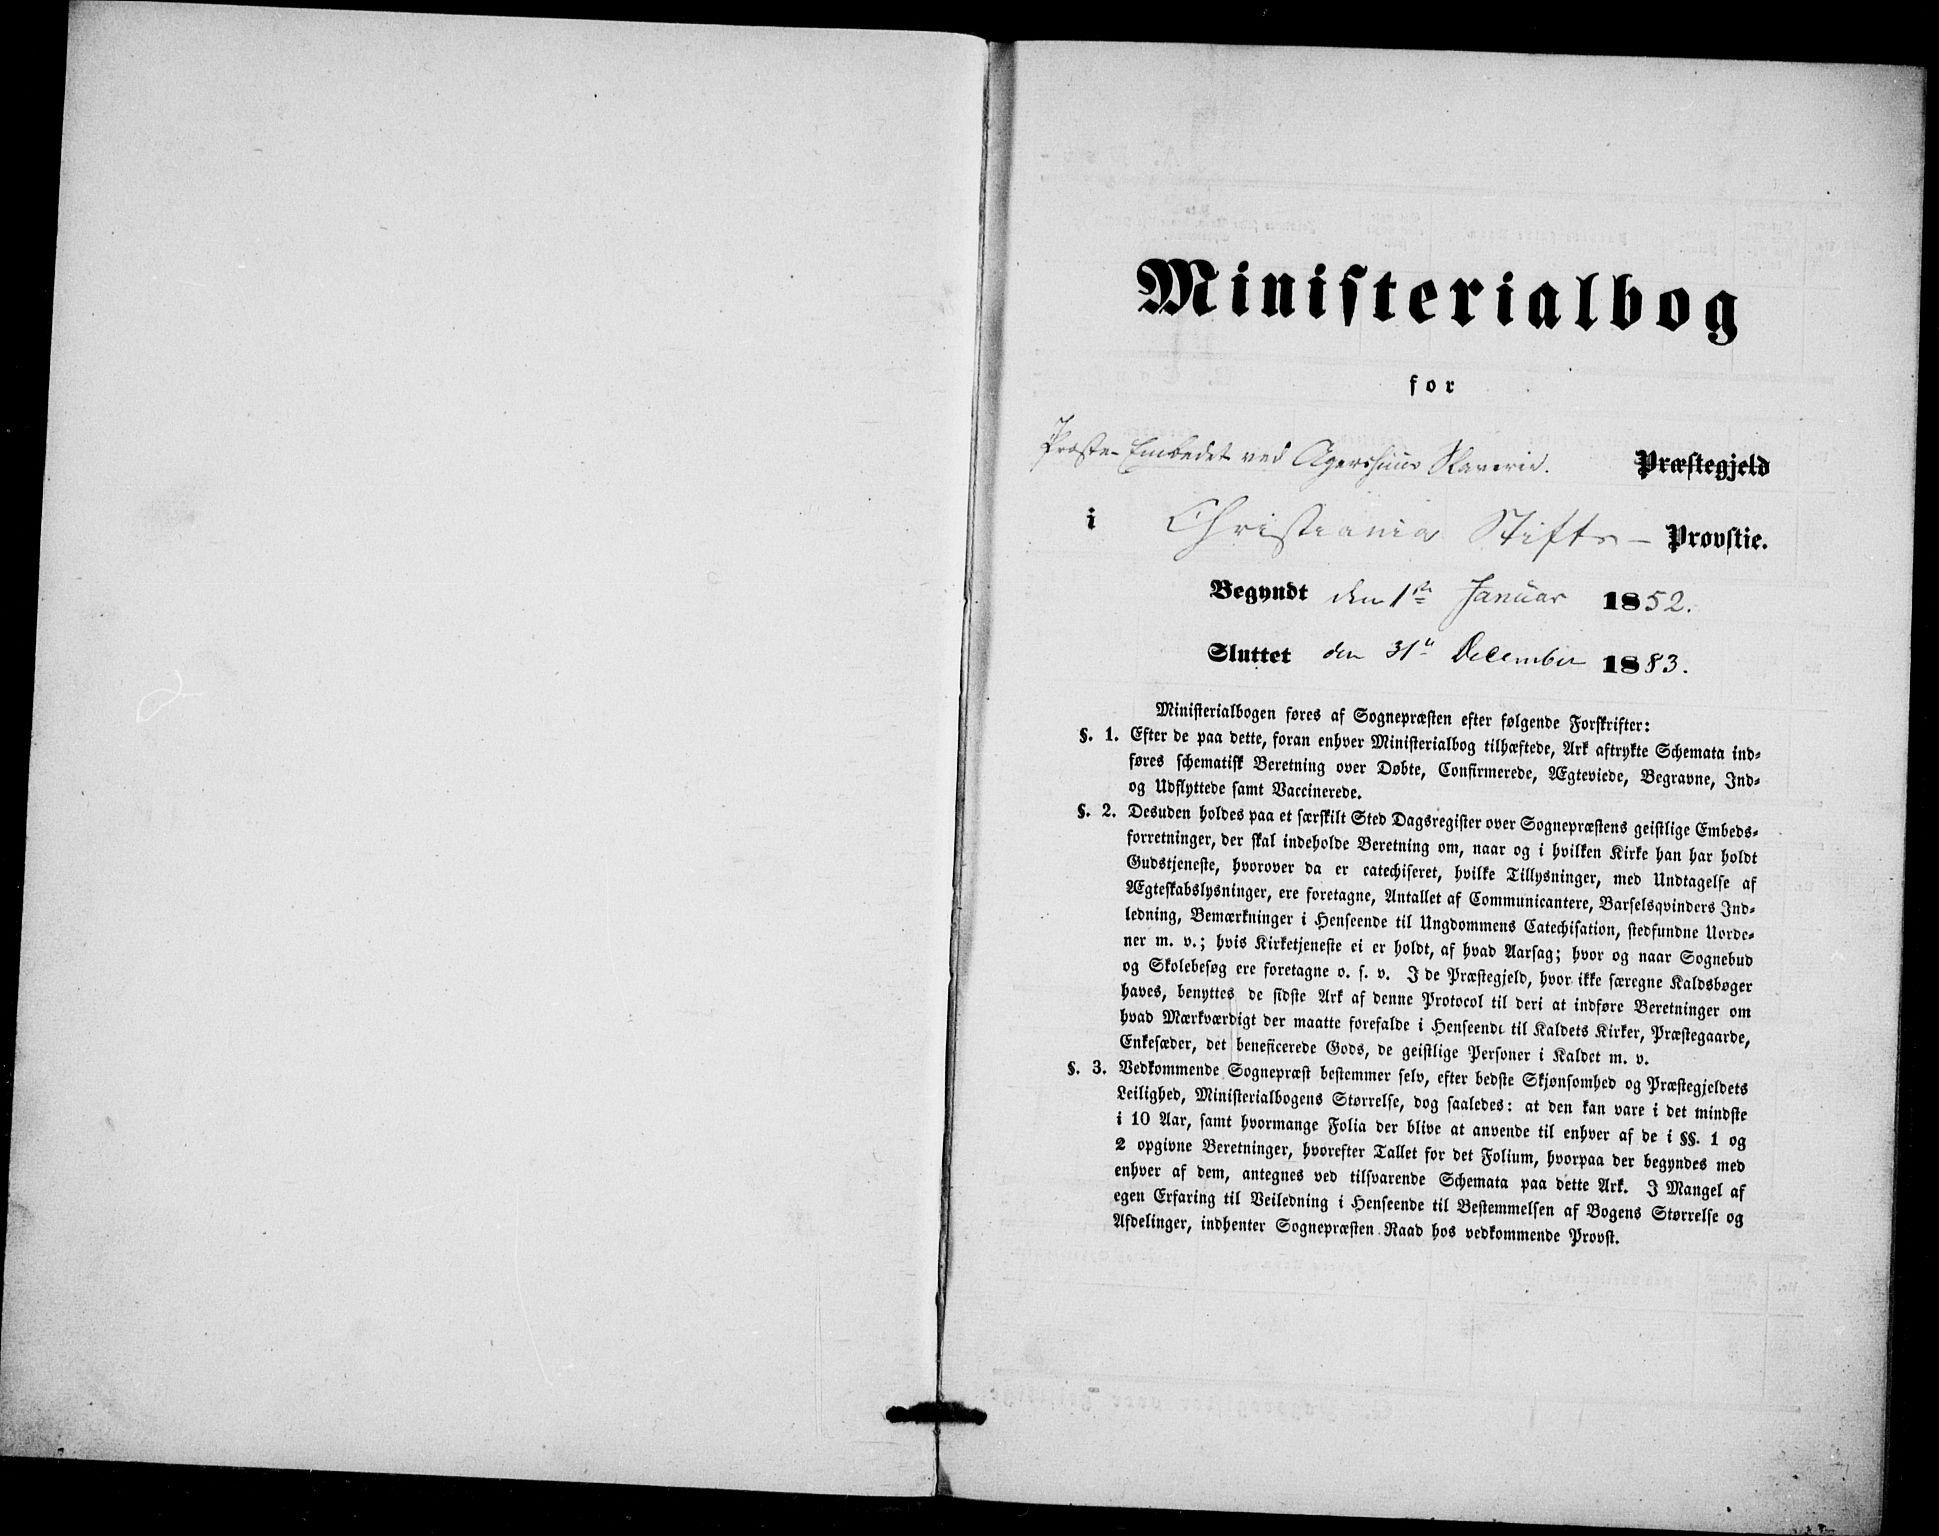 SAO, Akershus festnings slaveri Kirkebøker, F/Fa/L0002: Ministerialbok nr. 2, 1852-1883